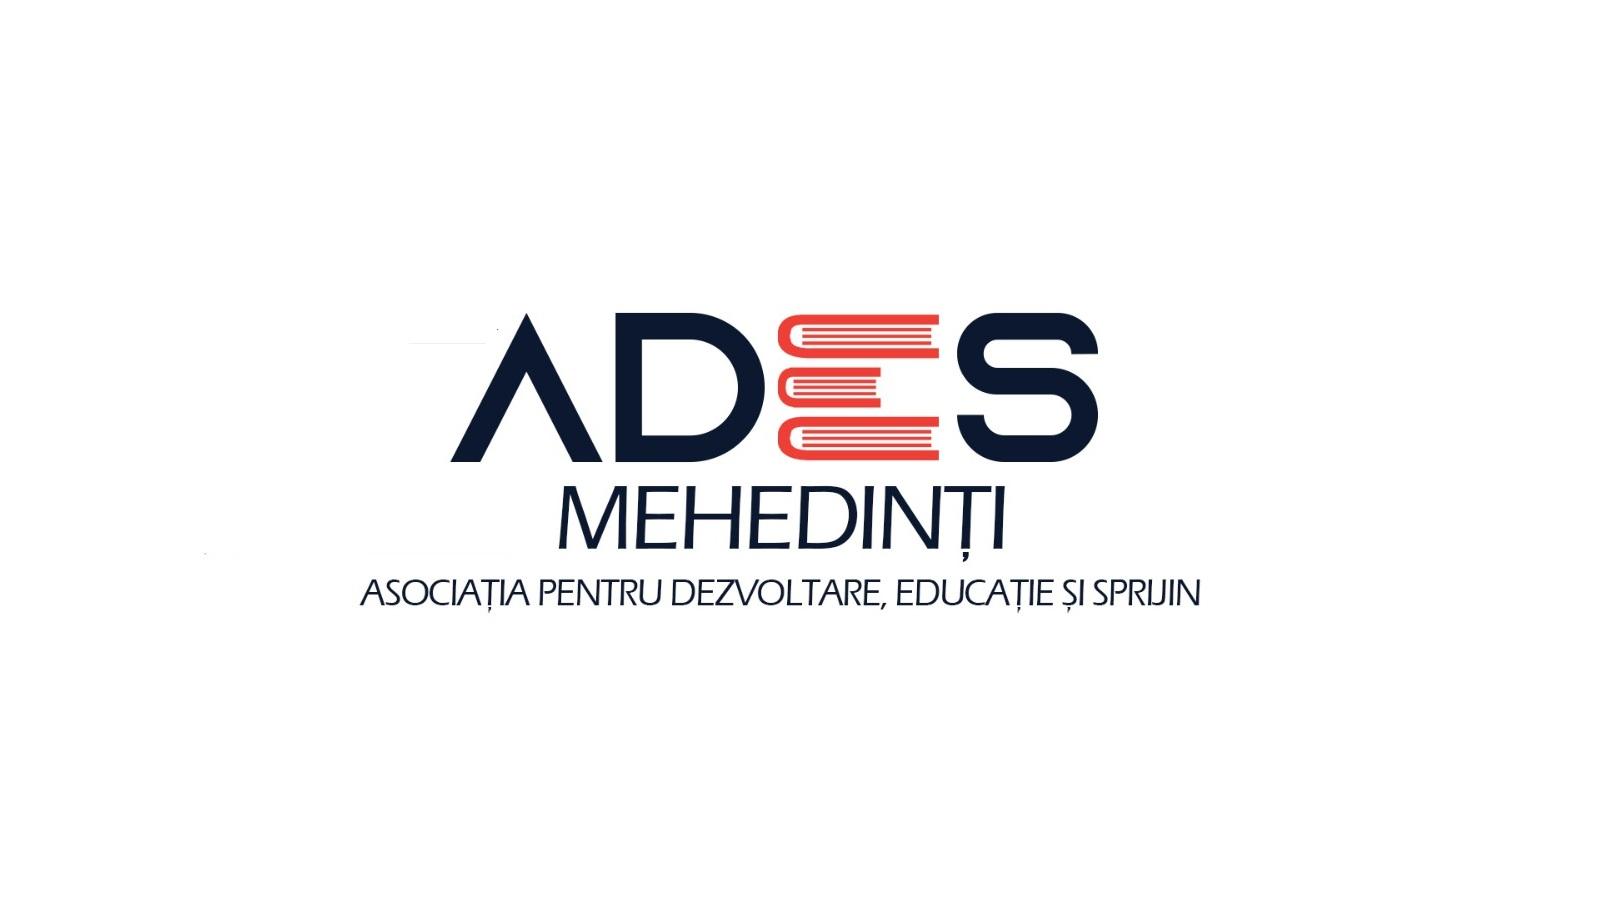 ADES - Mehedinți logo